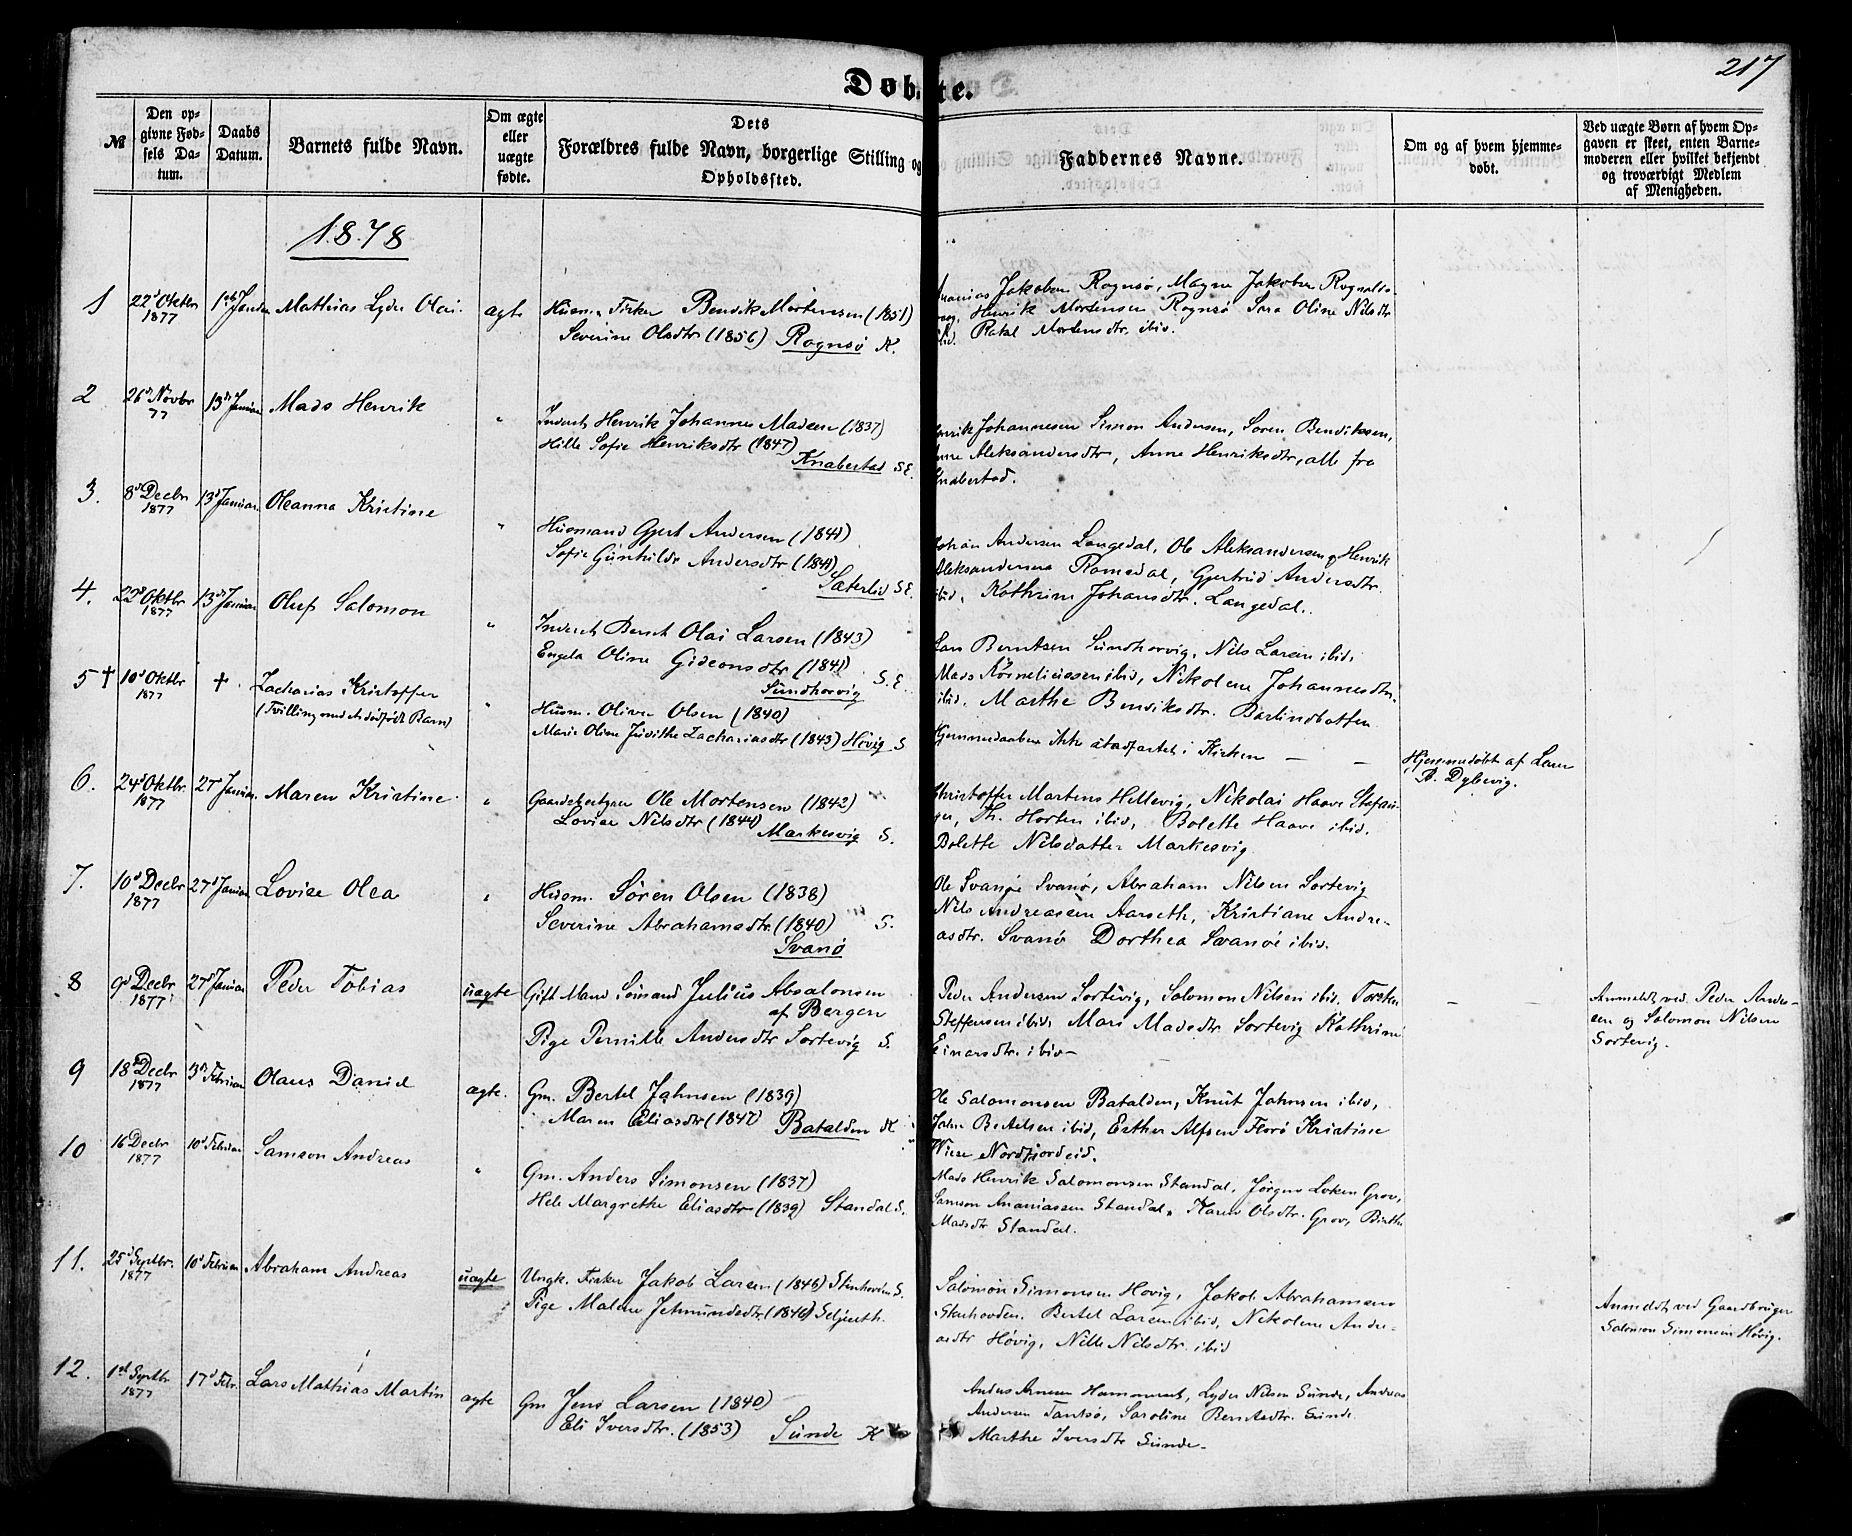 SAB, Kinn sokneprestembete, H/Haa/Haaa/L0006: Ministerialbok nr. A 6, 1857-1885, s. 217